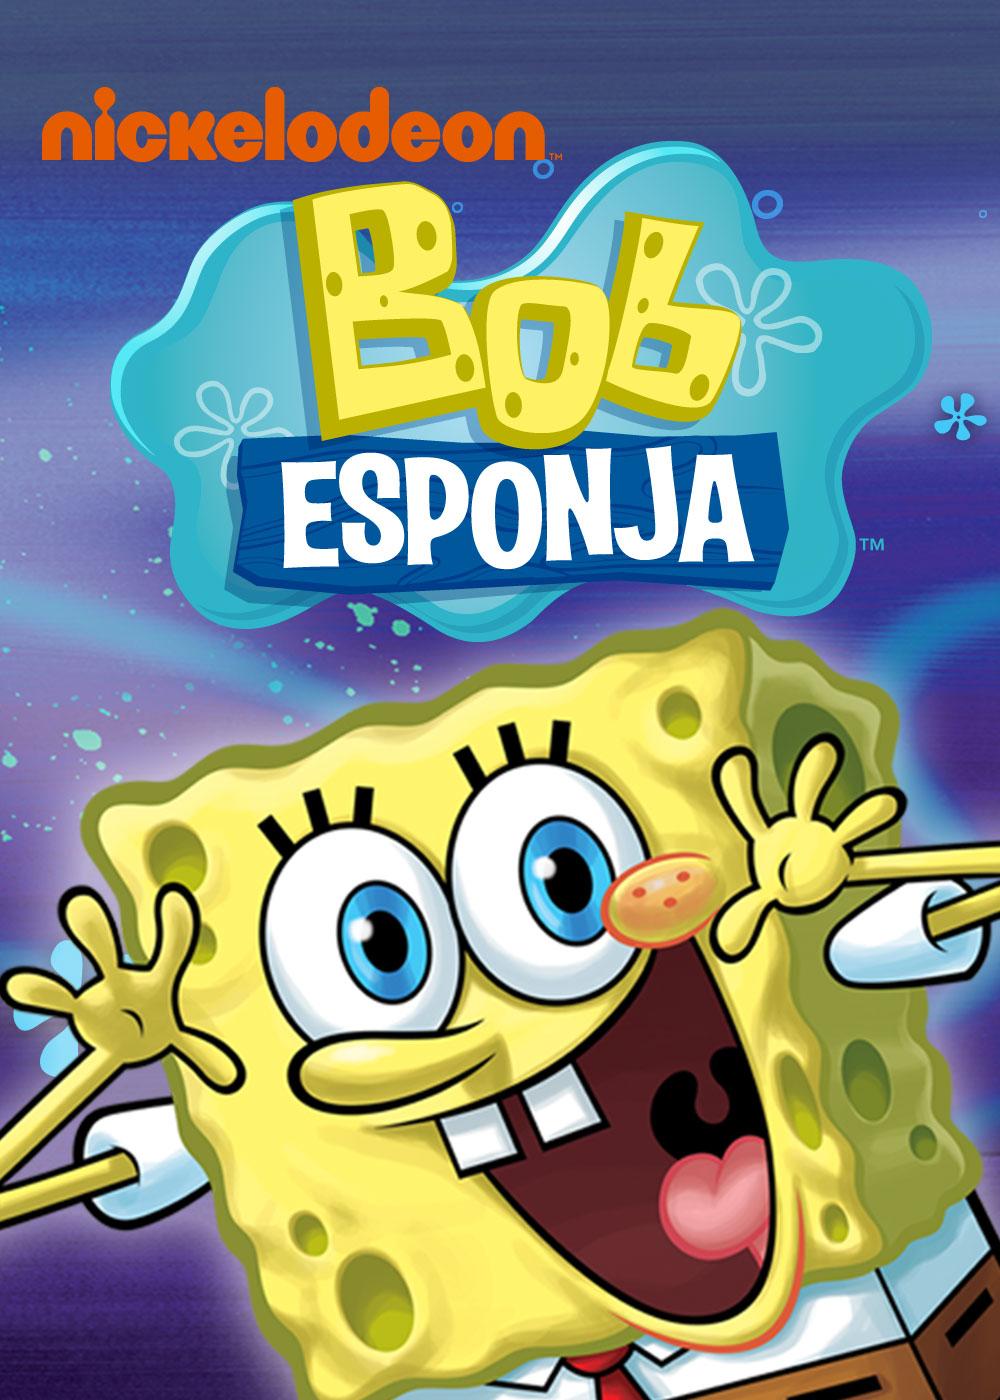 Bob Esponja Serie Completa 1080p Dvdrip Audio Latino Seireshd Series Latino